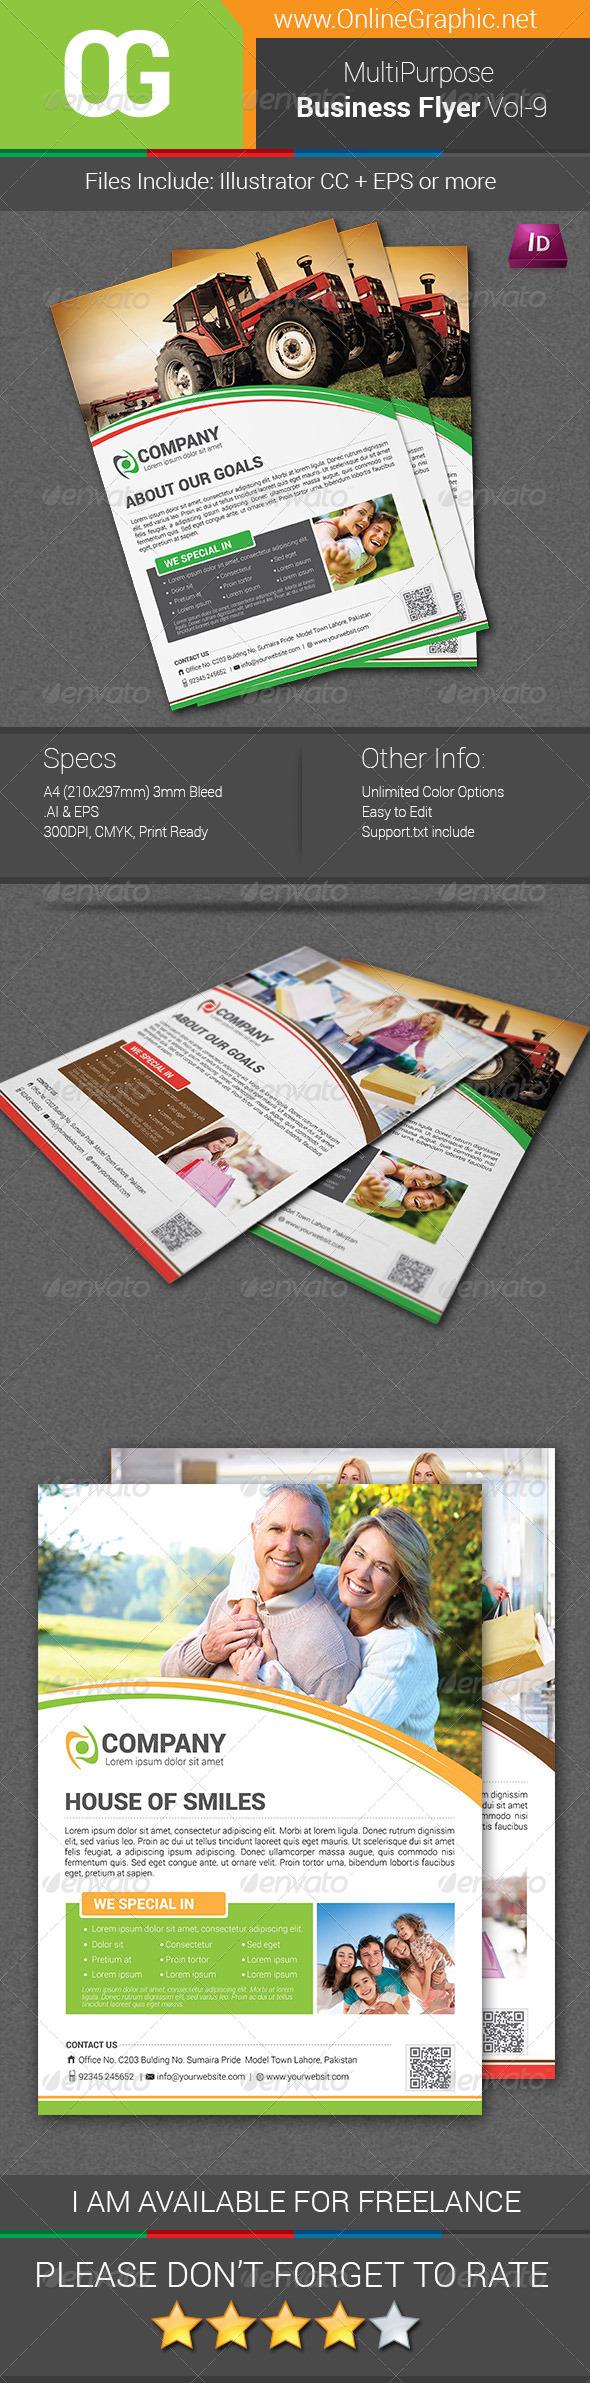 GraphicRiver Multipurpose Business Flyer Vol-09 8496872